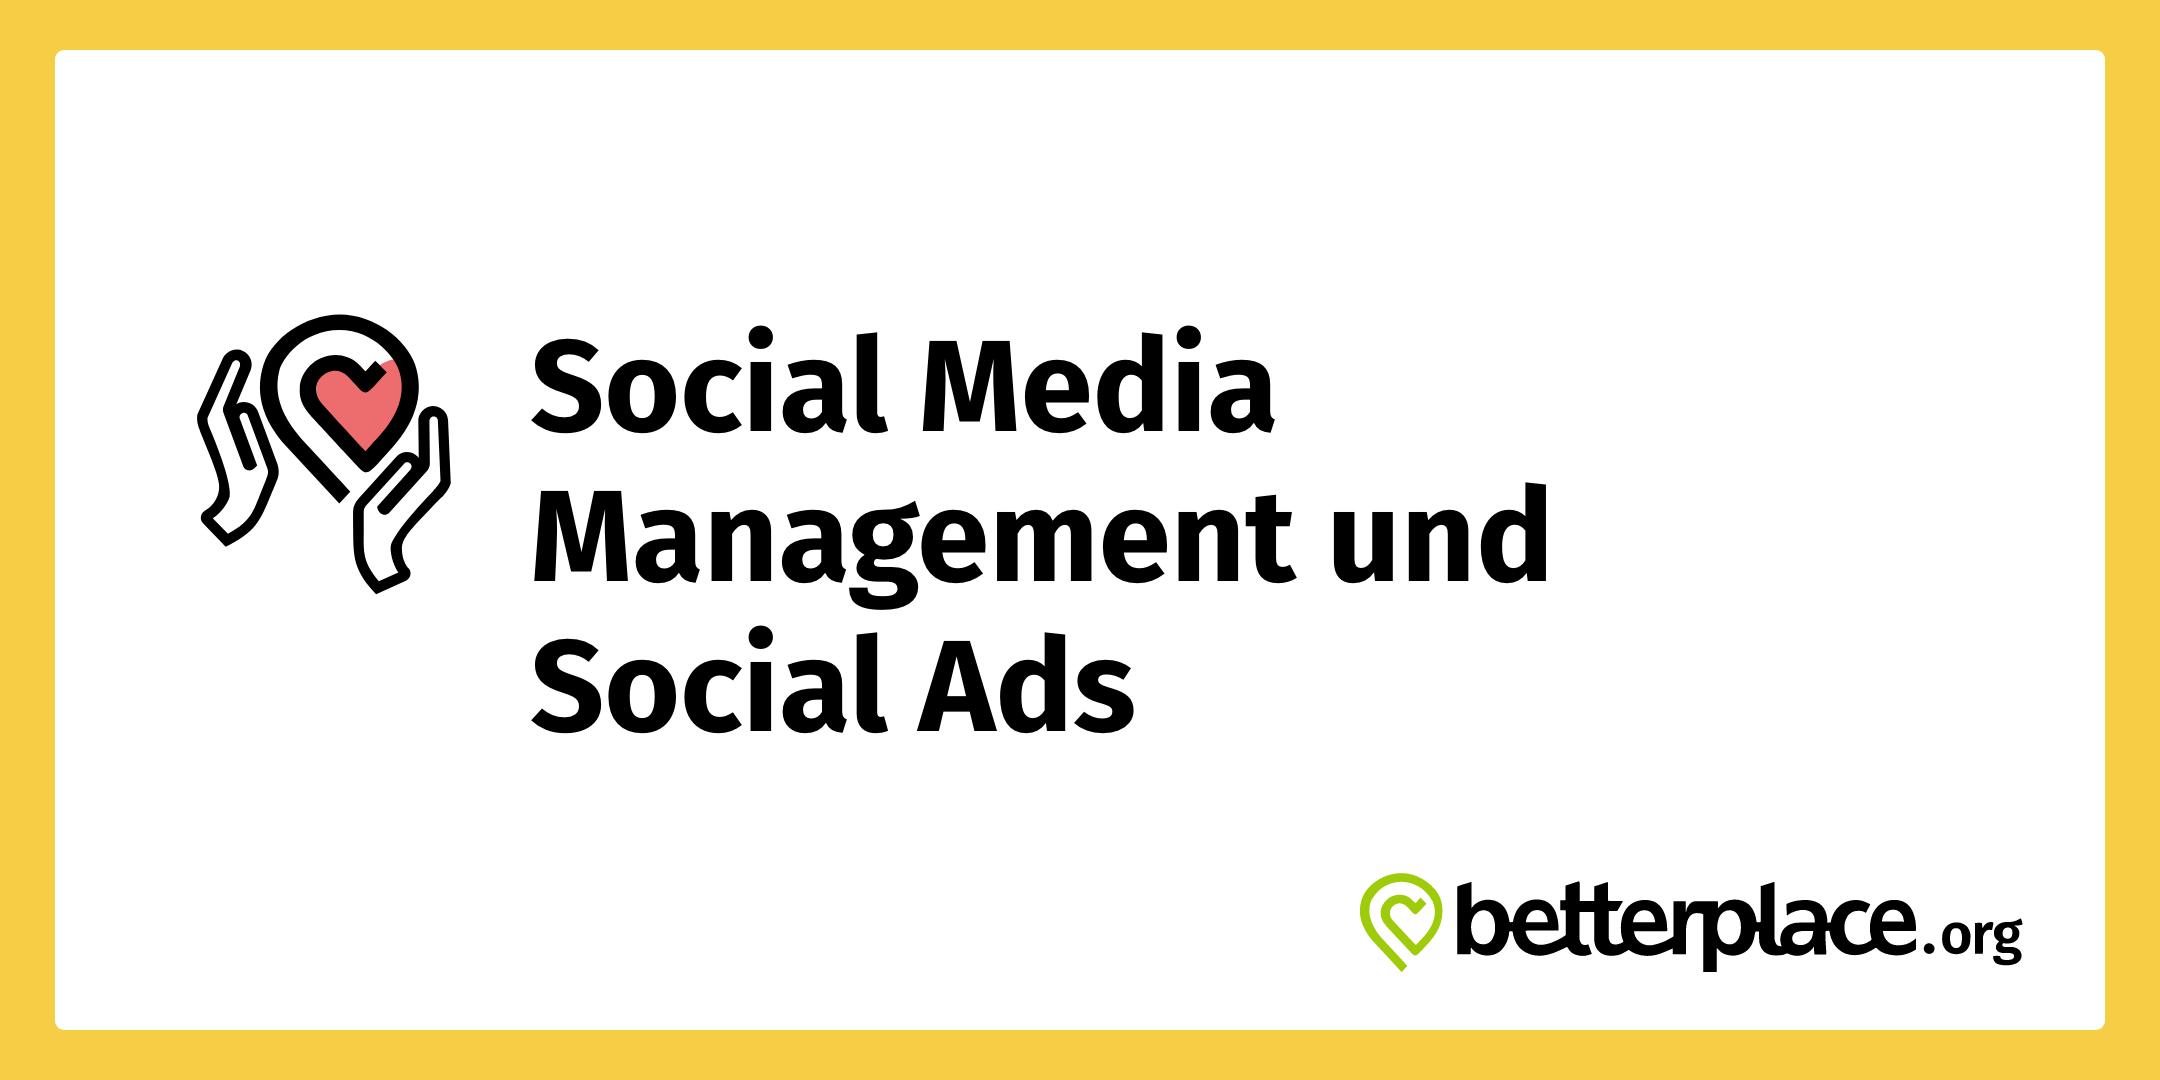 betterplace.org Webinar Social Media Management und Social Ads